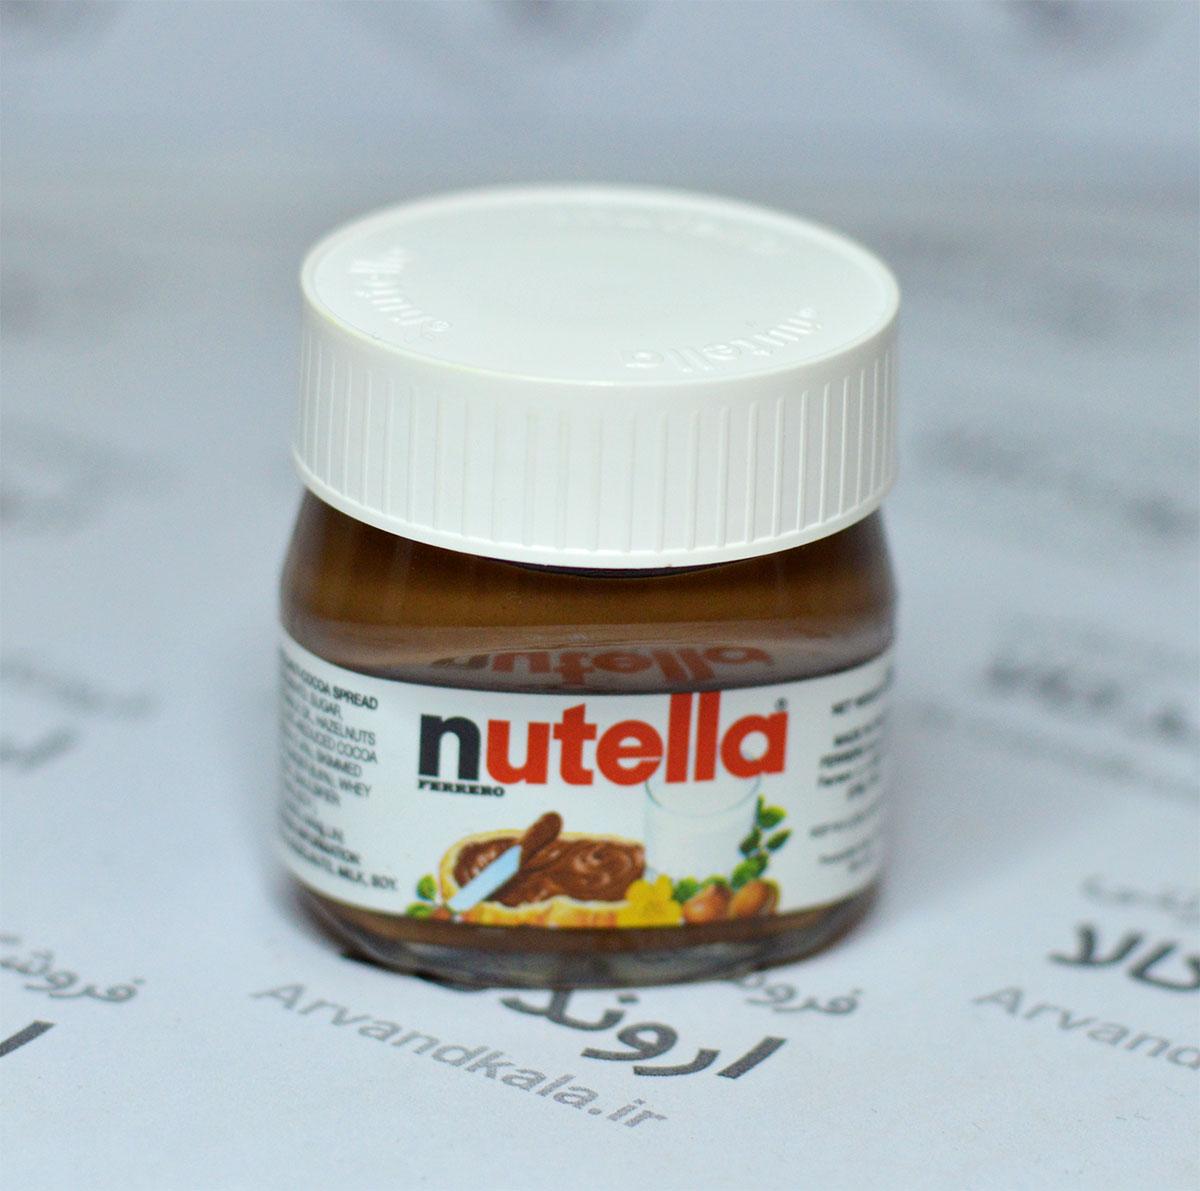 شکلات صبحانه نوتلا ۳۰ گرم